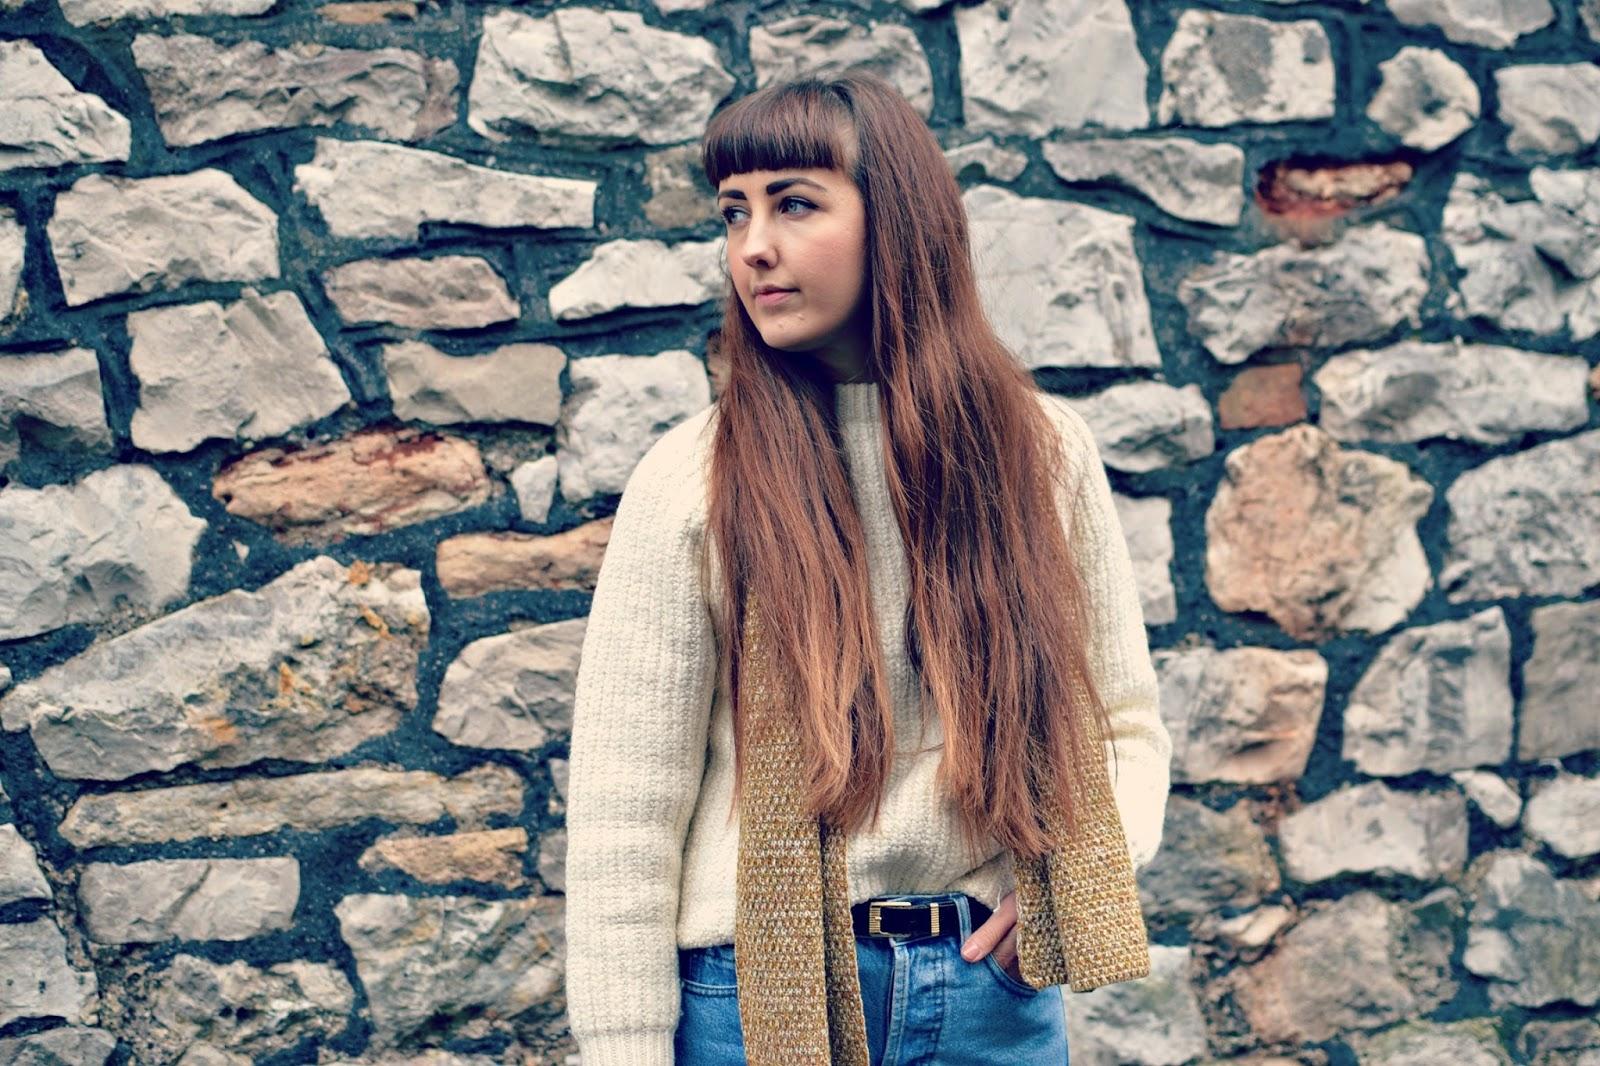 charity shop jumper, vintage levi jeans, asos scarf